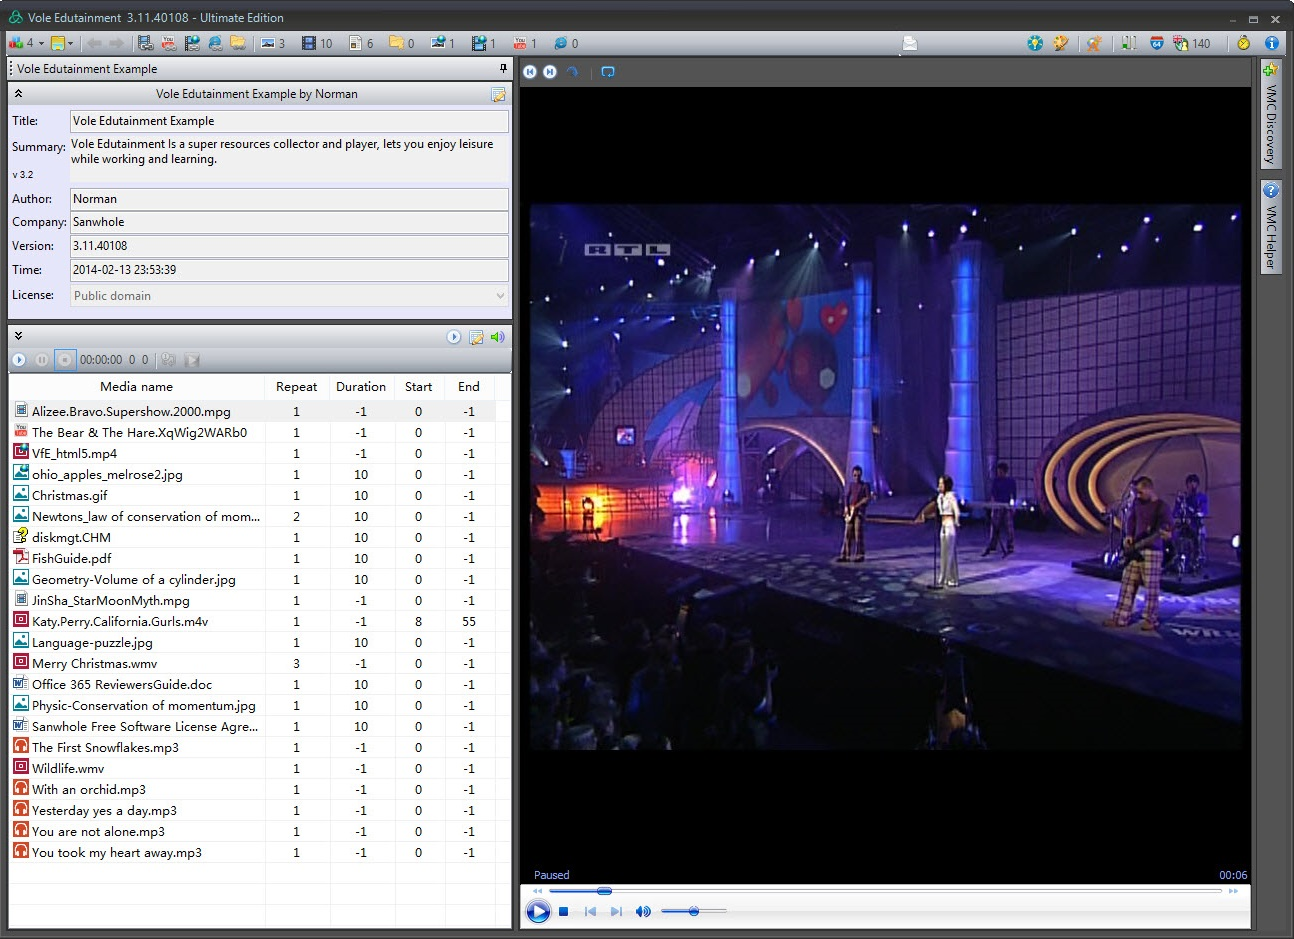 Vole Edutainment Professional Edition, Video Software Screenshot